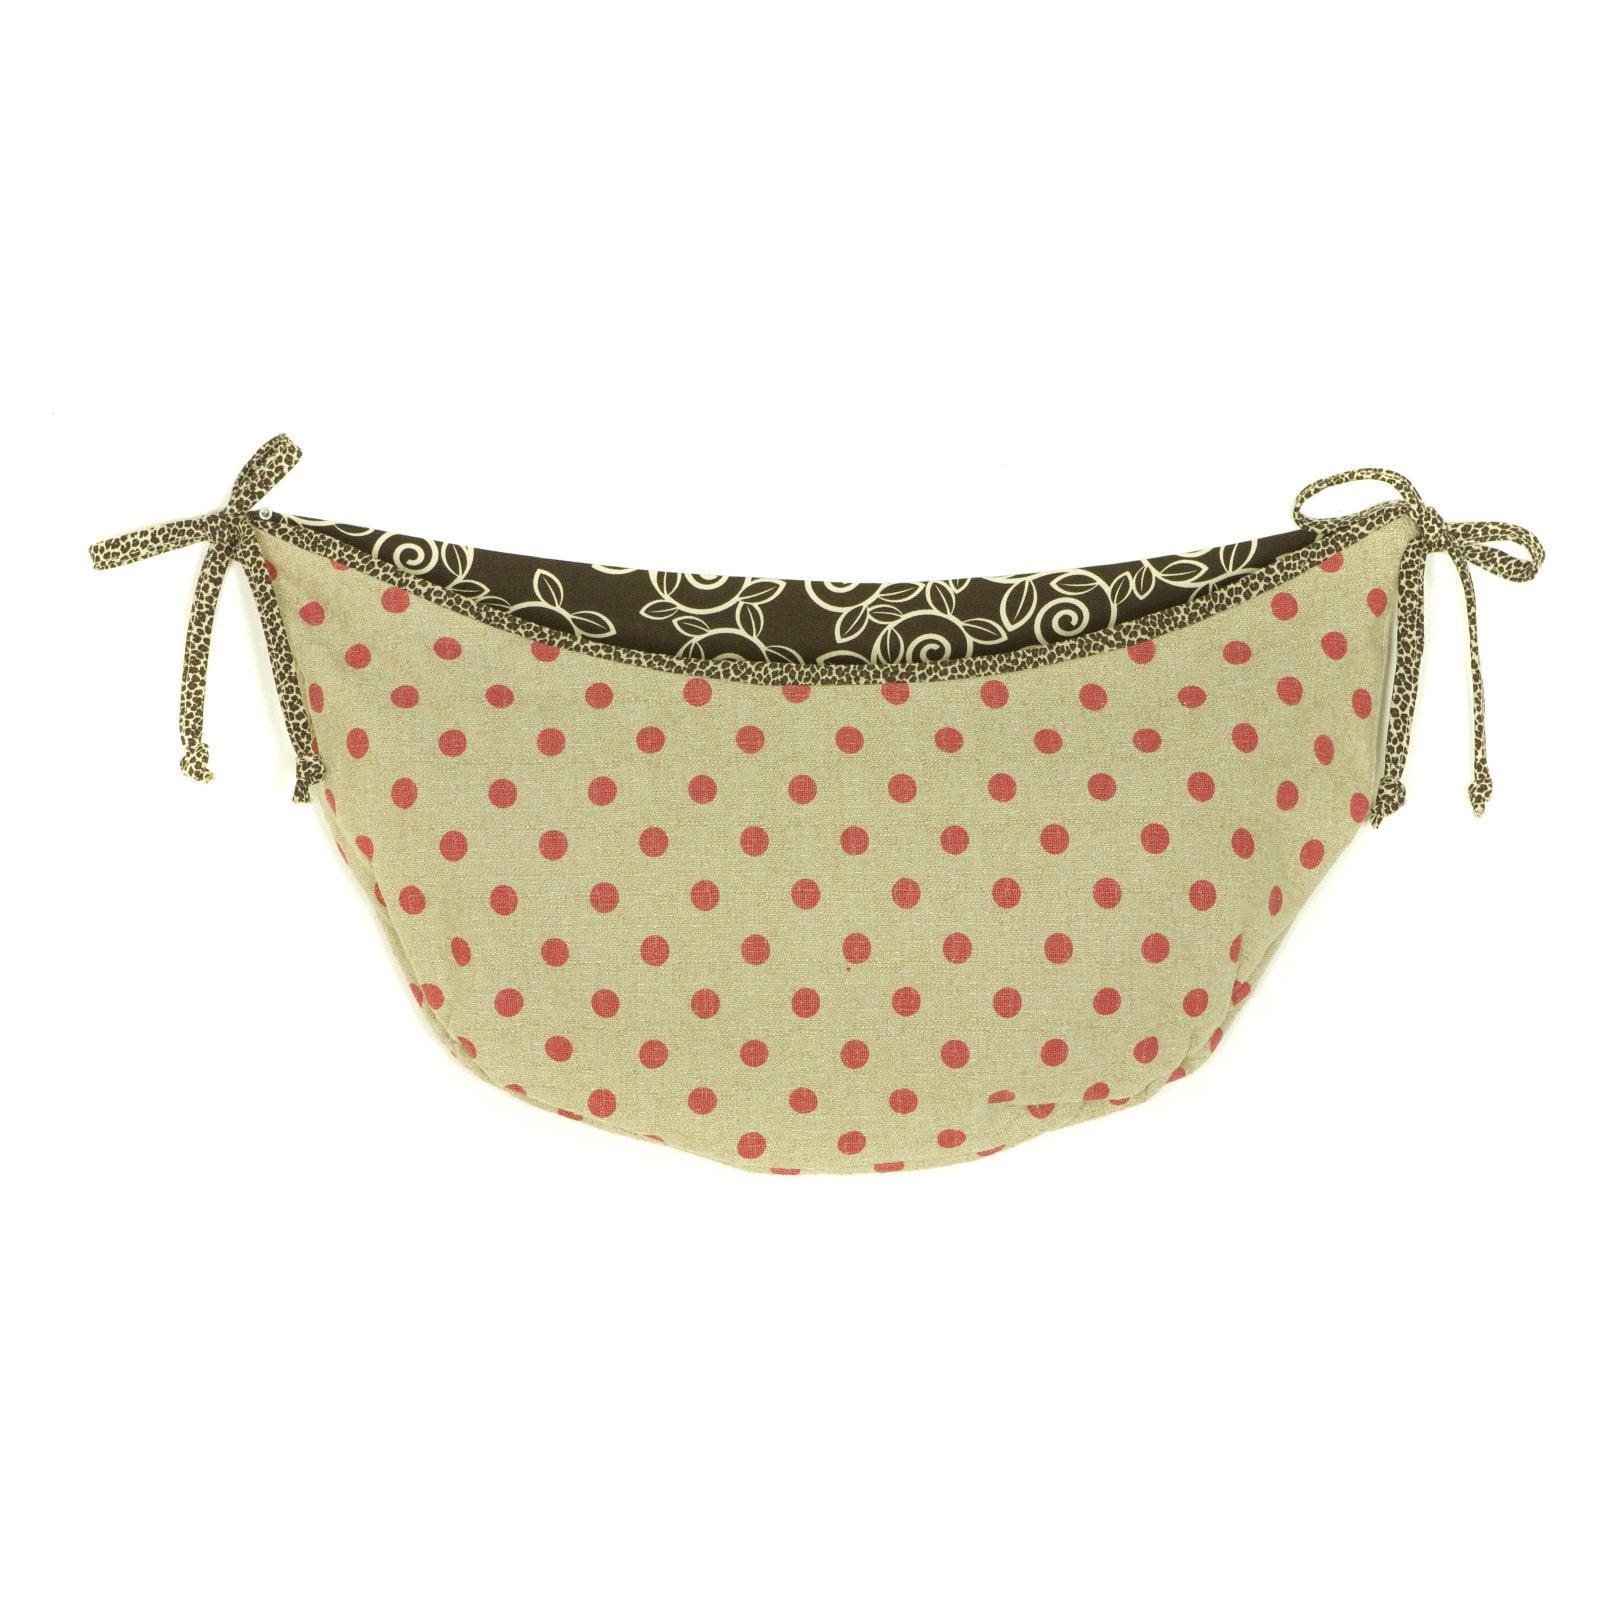 Cotton Tale Designs Raspberry Dot Toy Bag